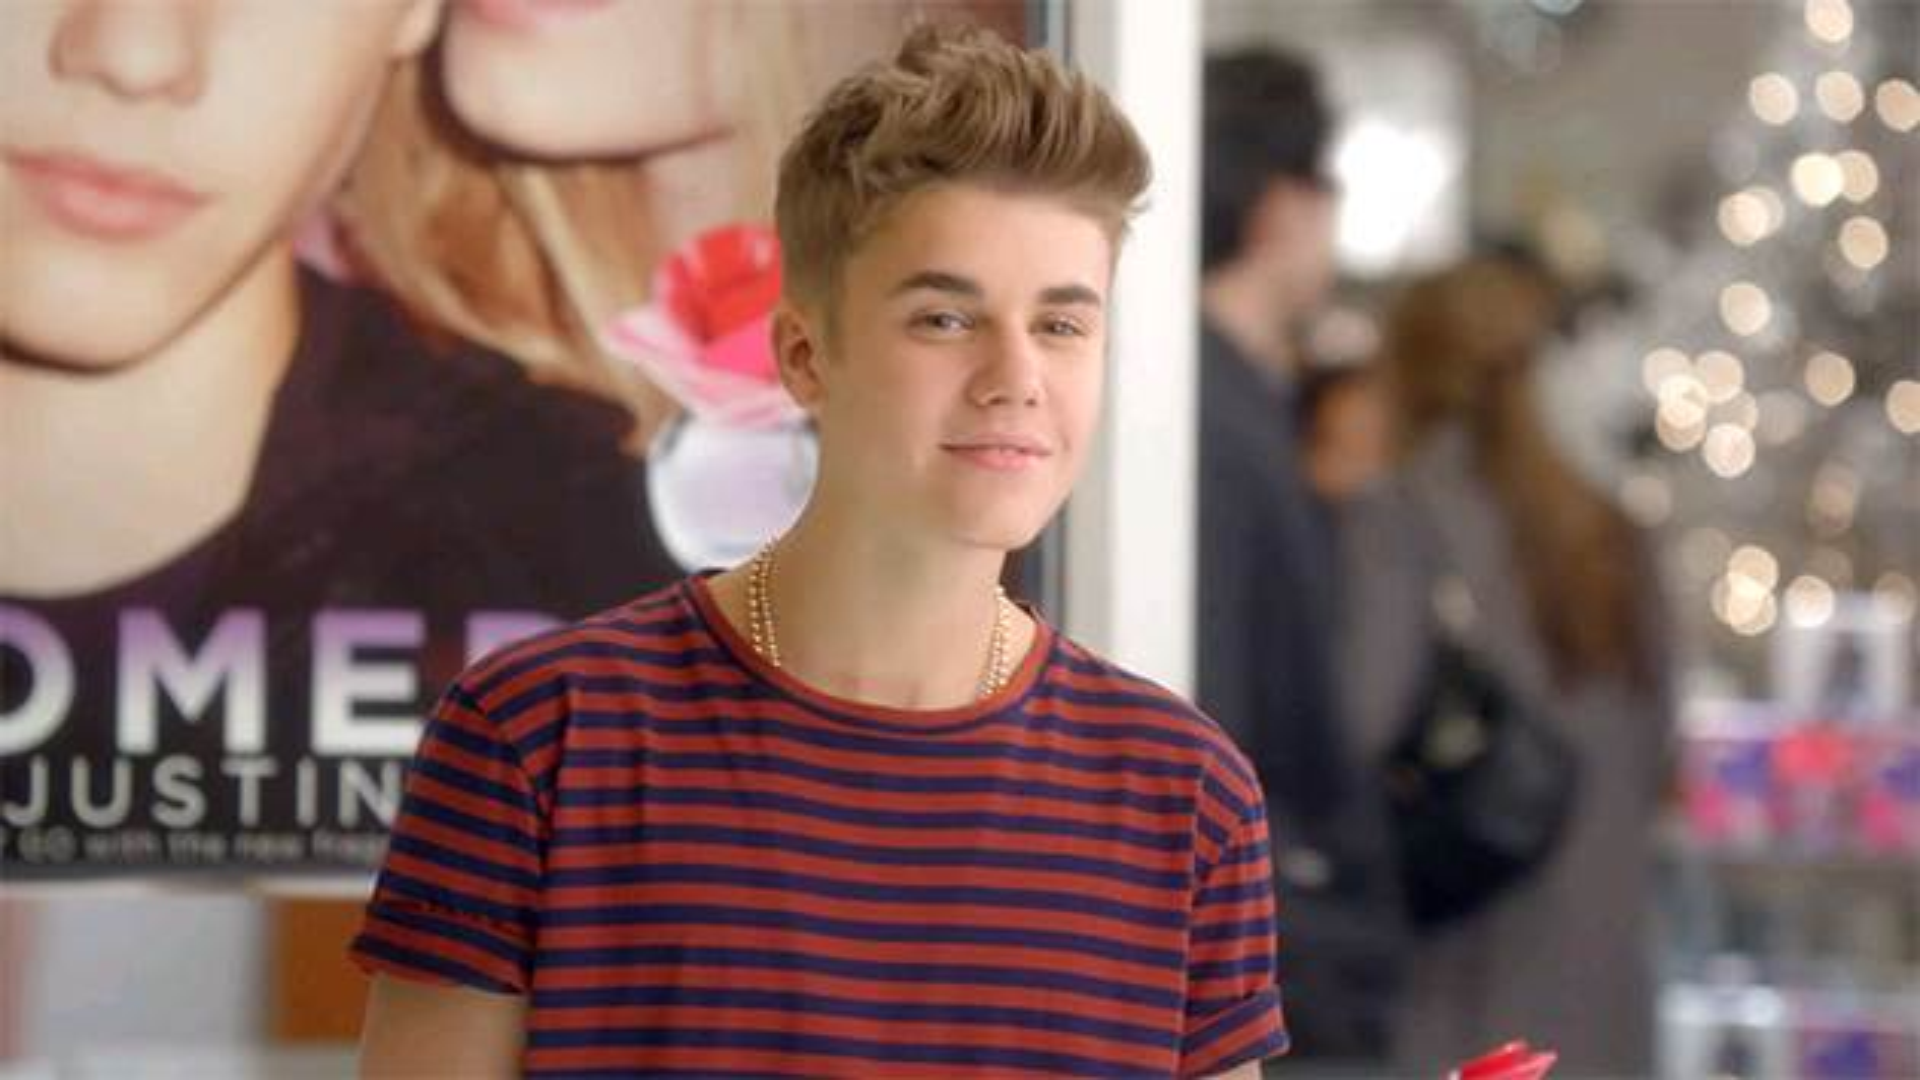 Justin-Bieber-Black-Friday-Macys-Werbespot